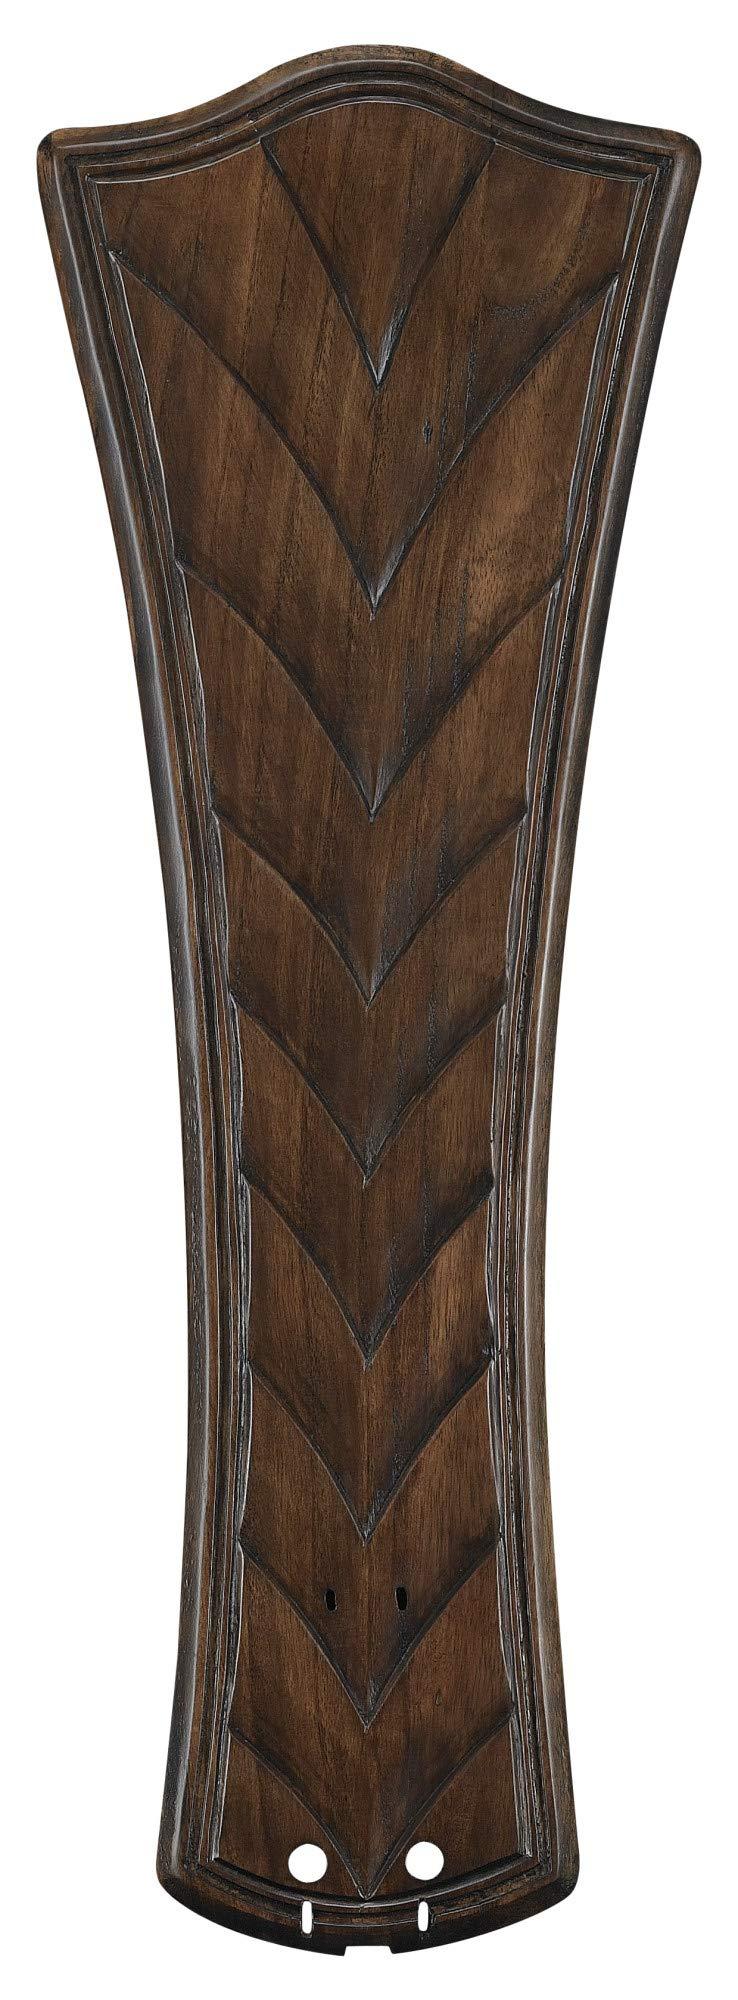 Fanimation B6060WA Concave Ribbed Carved Blade, 26-Inch, Walnut